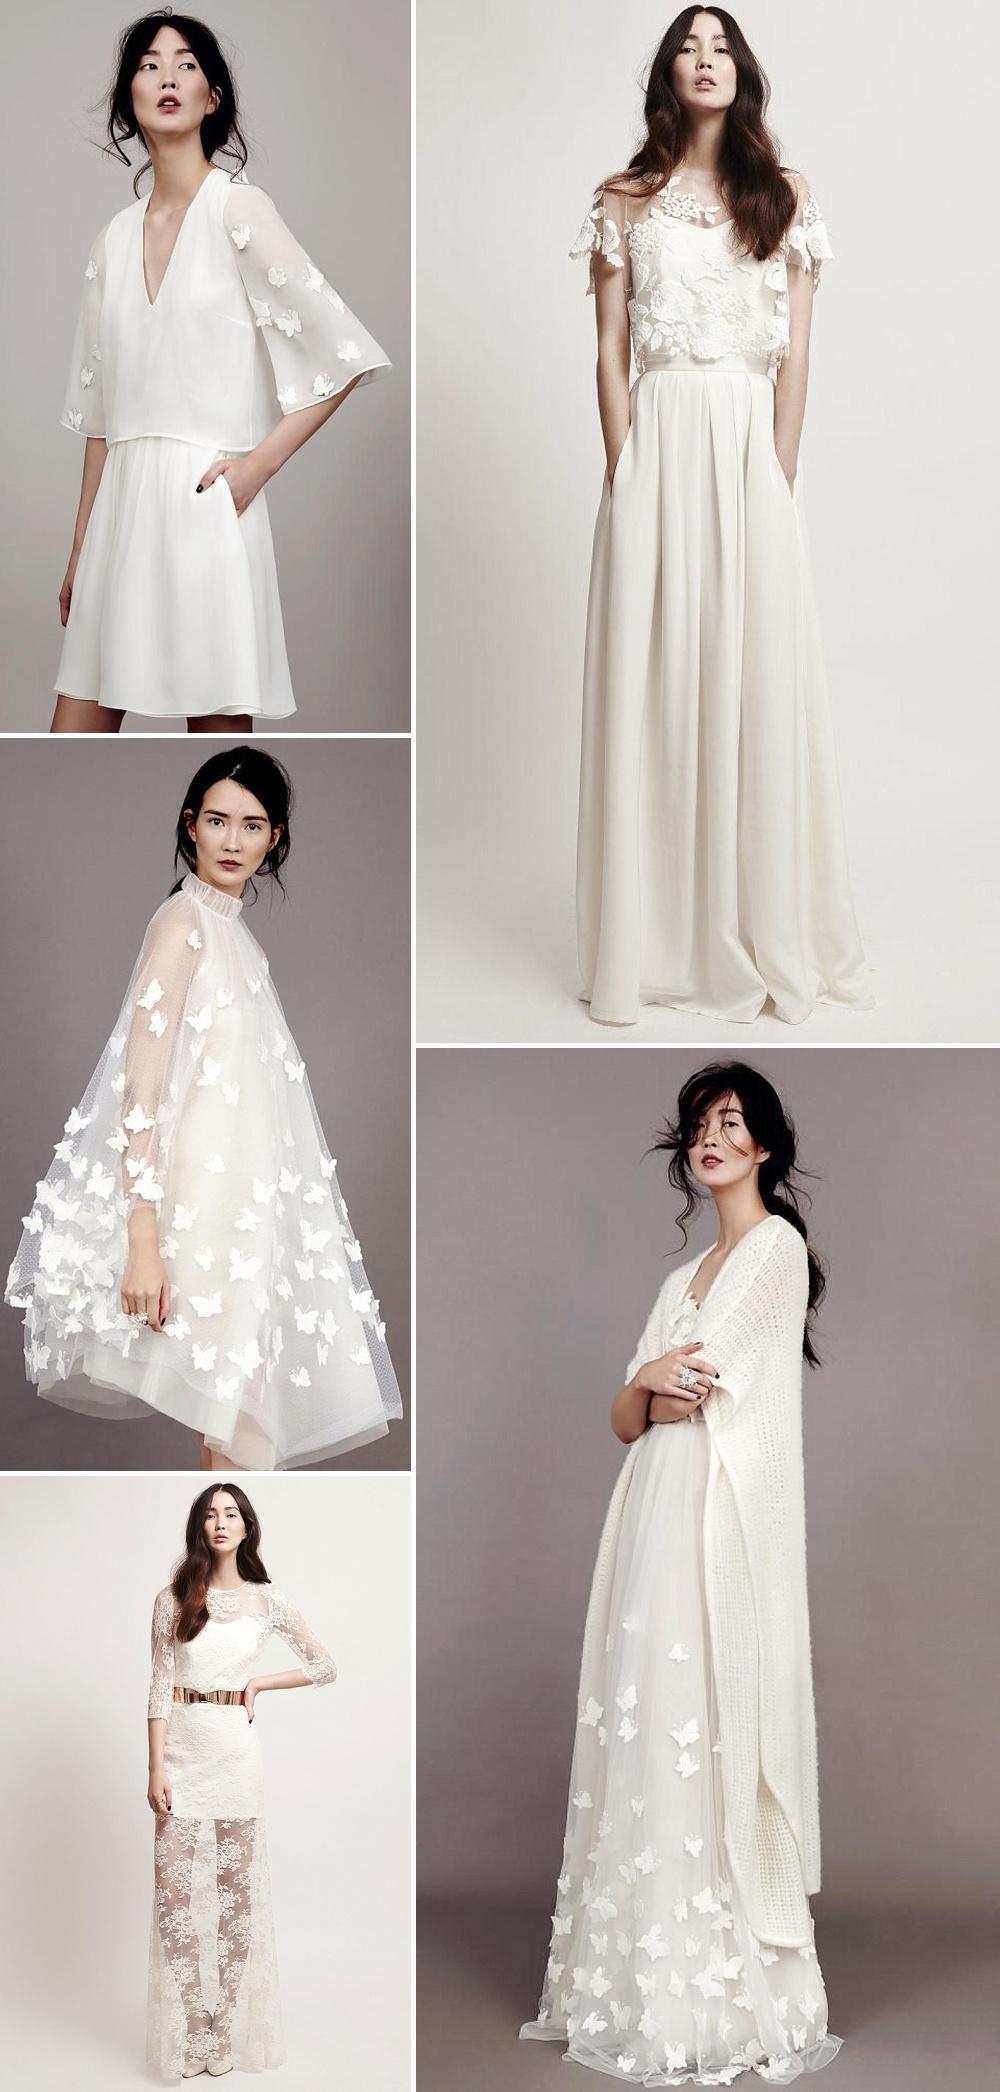 Wedding Dresses By Kaviar Gauche